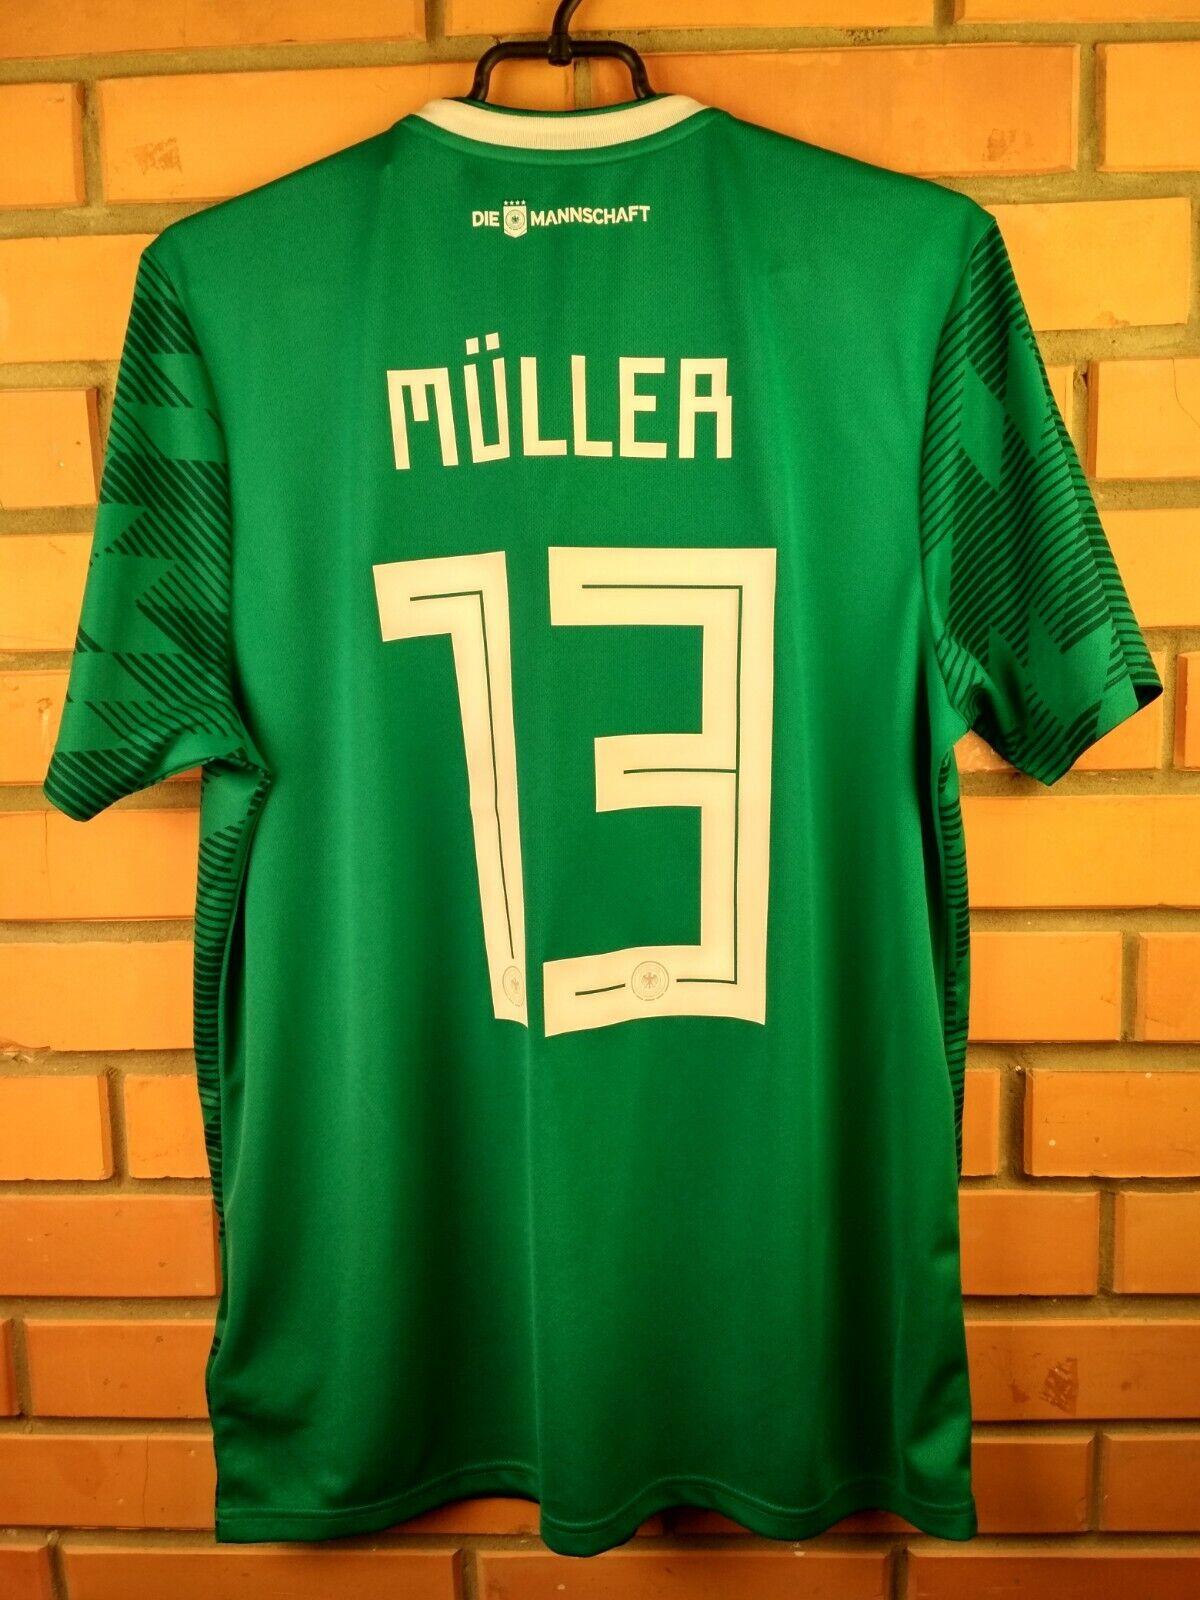 Muller Germany soccer jersey large 2018 away shirt BR3144 football Adidas